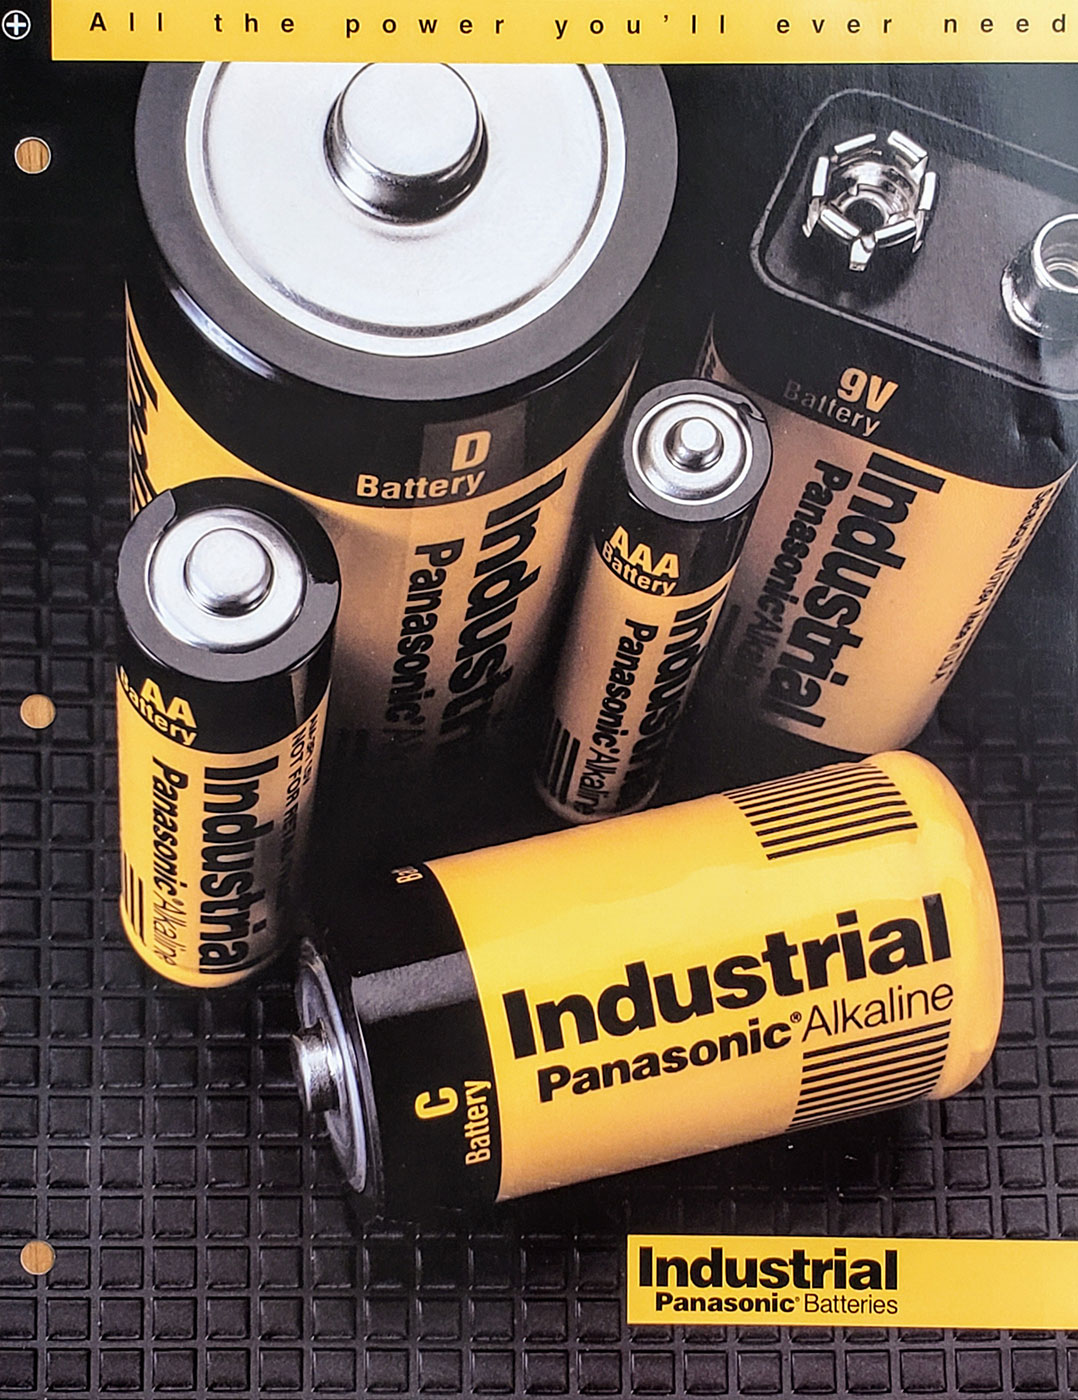 panasonic-batteries_all-the-power_ad_8